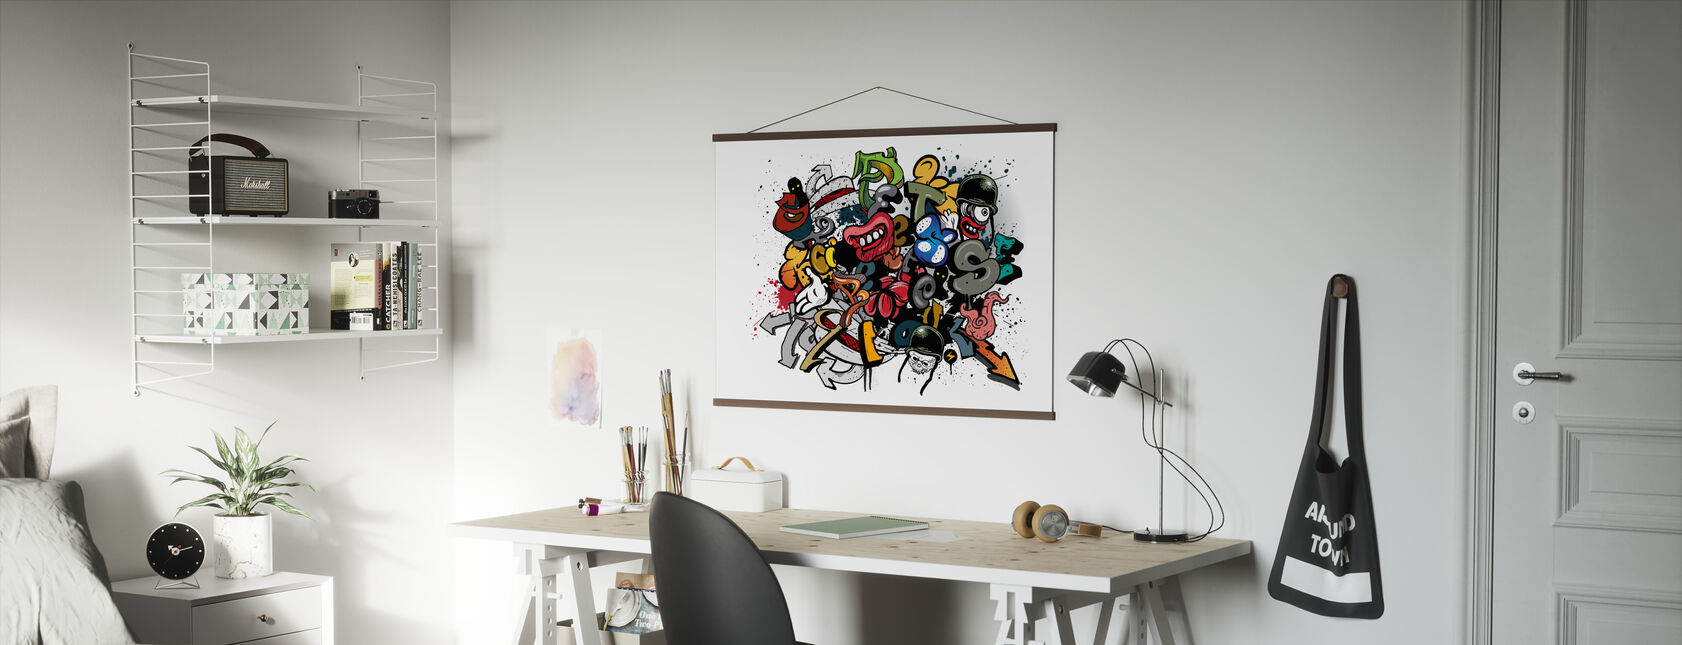 Graffiti Elements - Poster - Office